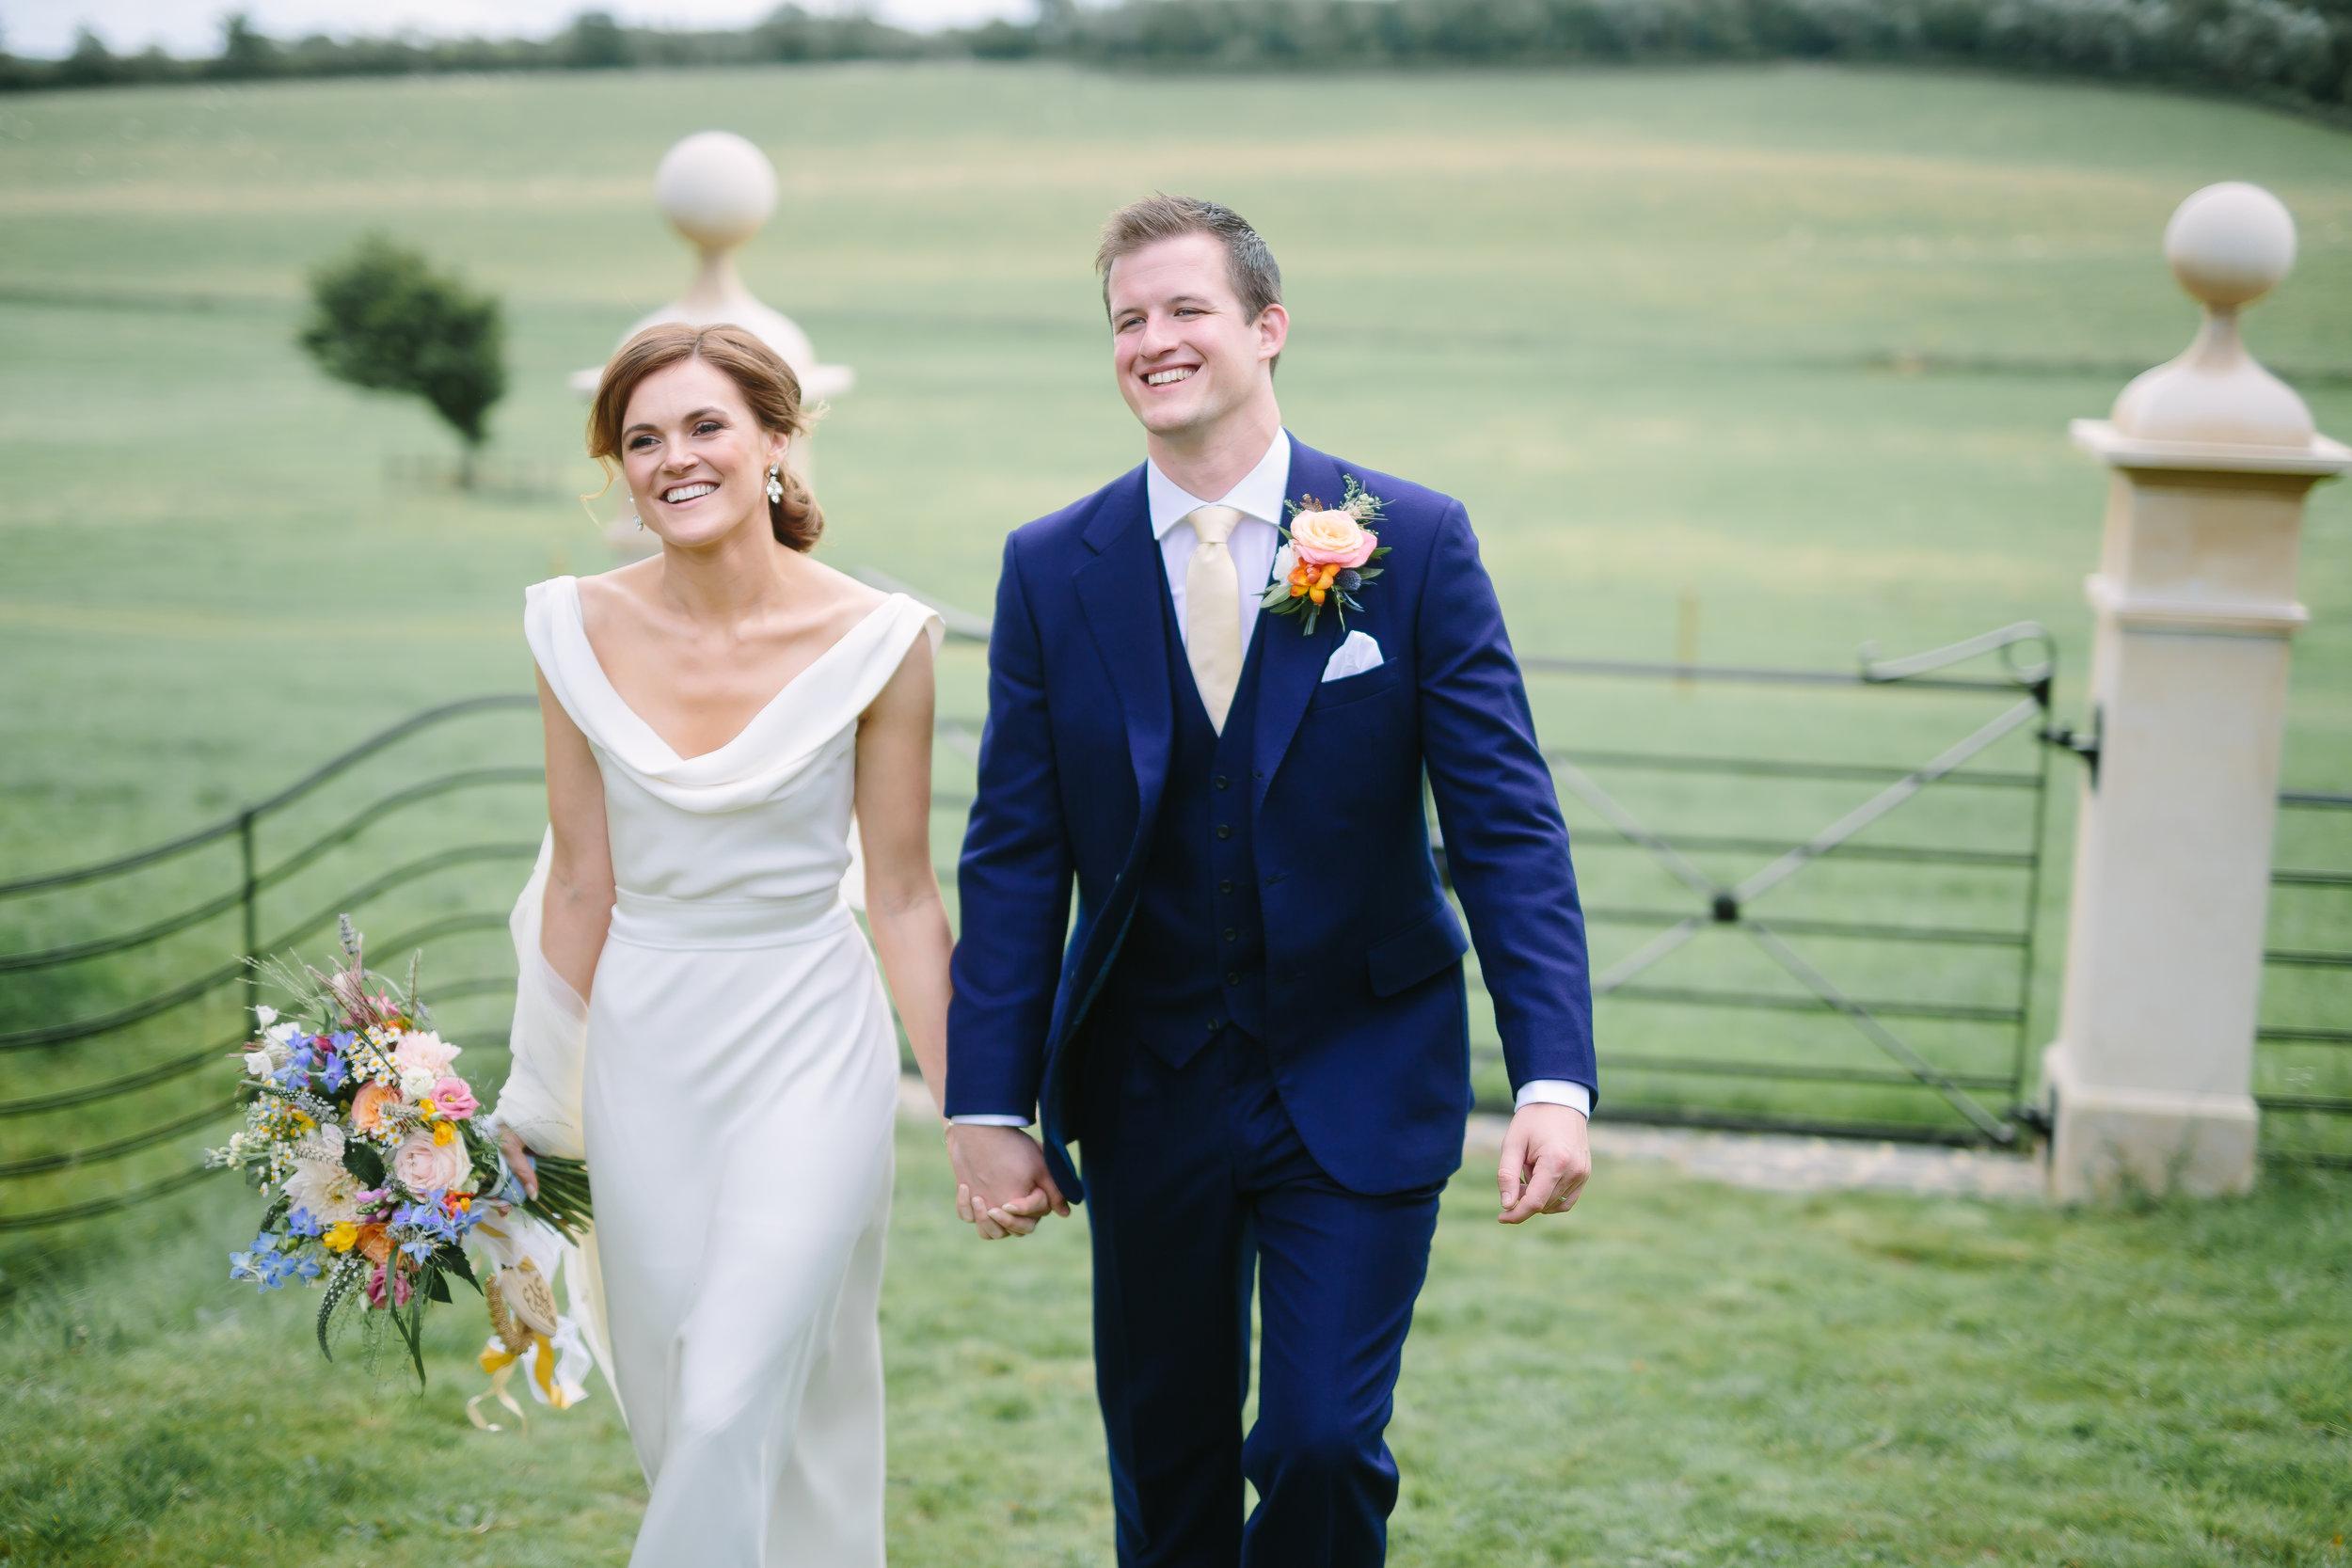 Wedding-Stockerston-Weddingphotographer-24.jpg